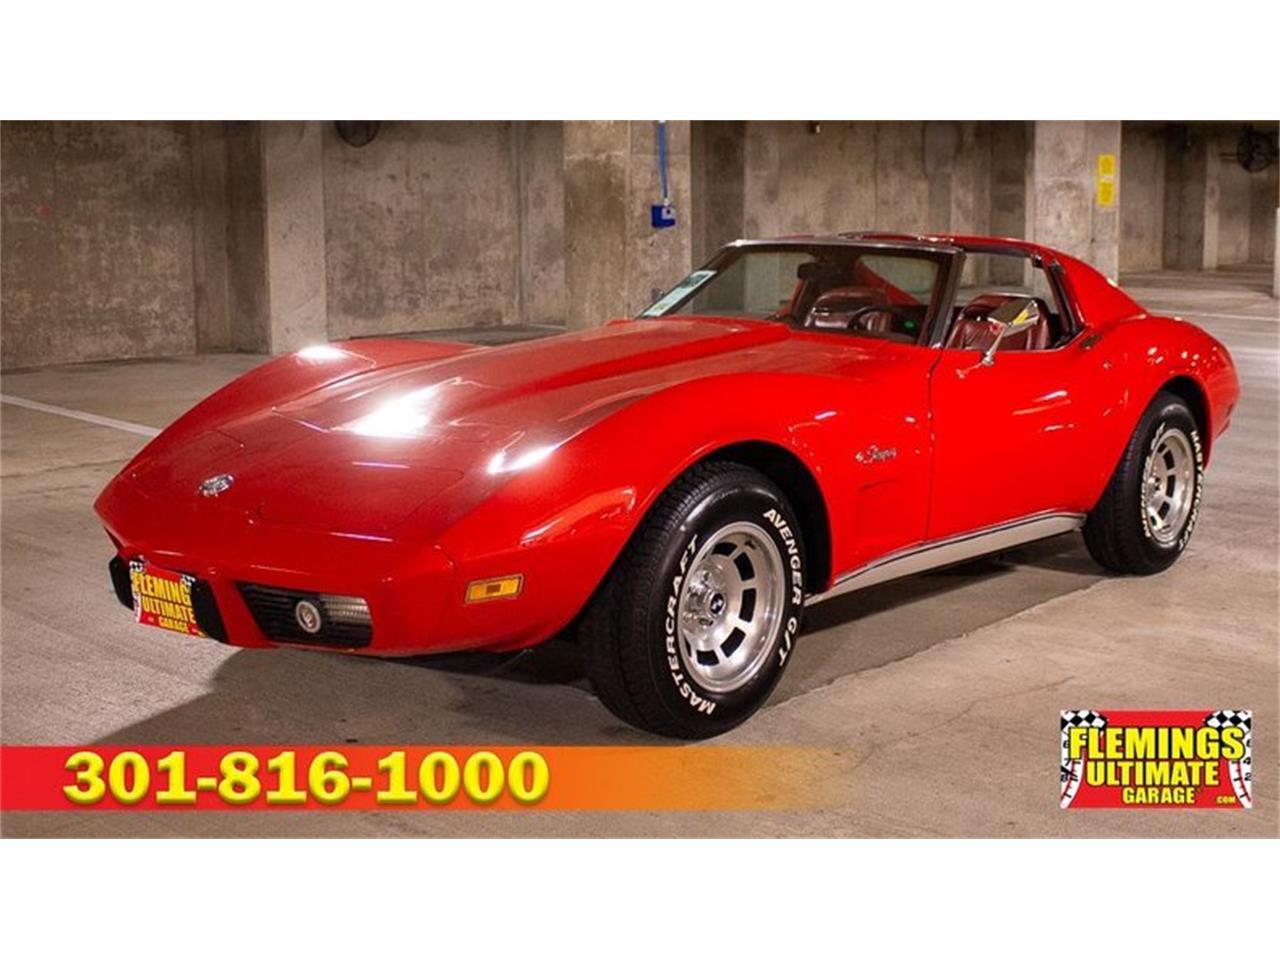 Corvettes For Sale In Md >> For Sale 1976 Chevrolet Corvette In Rockville Maryland